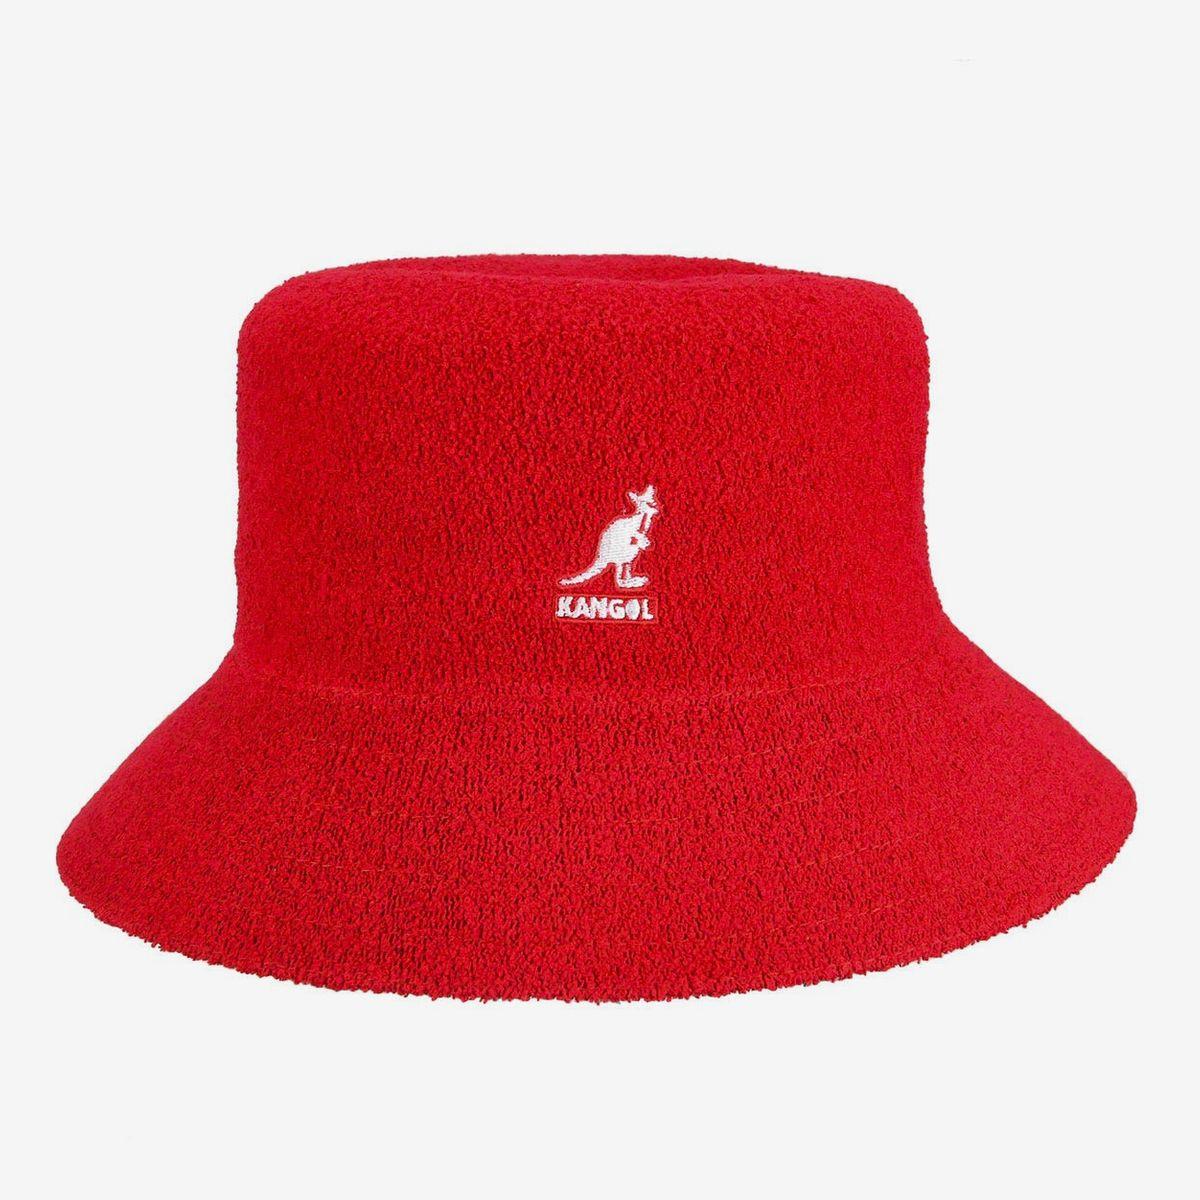 11 Best Bucket Hats For 2020 The Strategist New York Magazine